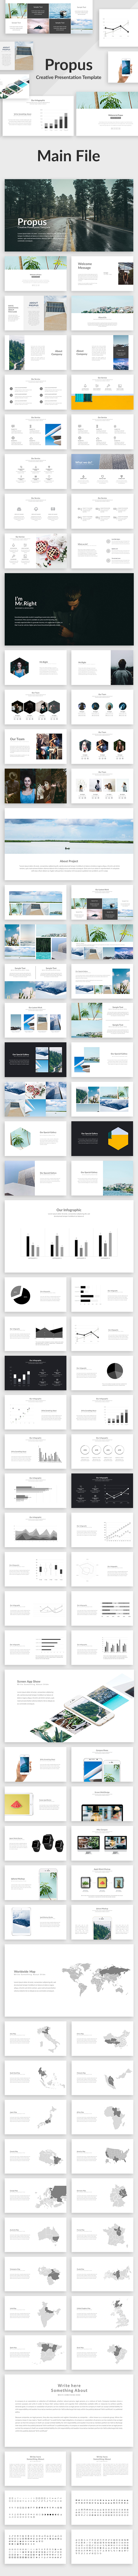 Propus - Creative Google Slide Template - Google Slides Presentation Templates